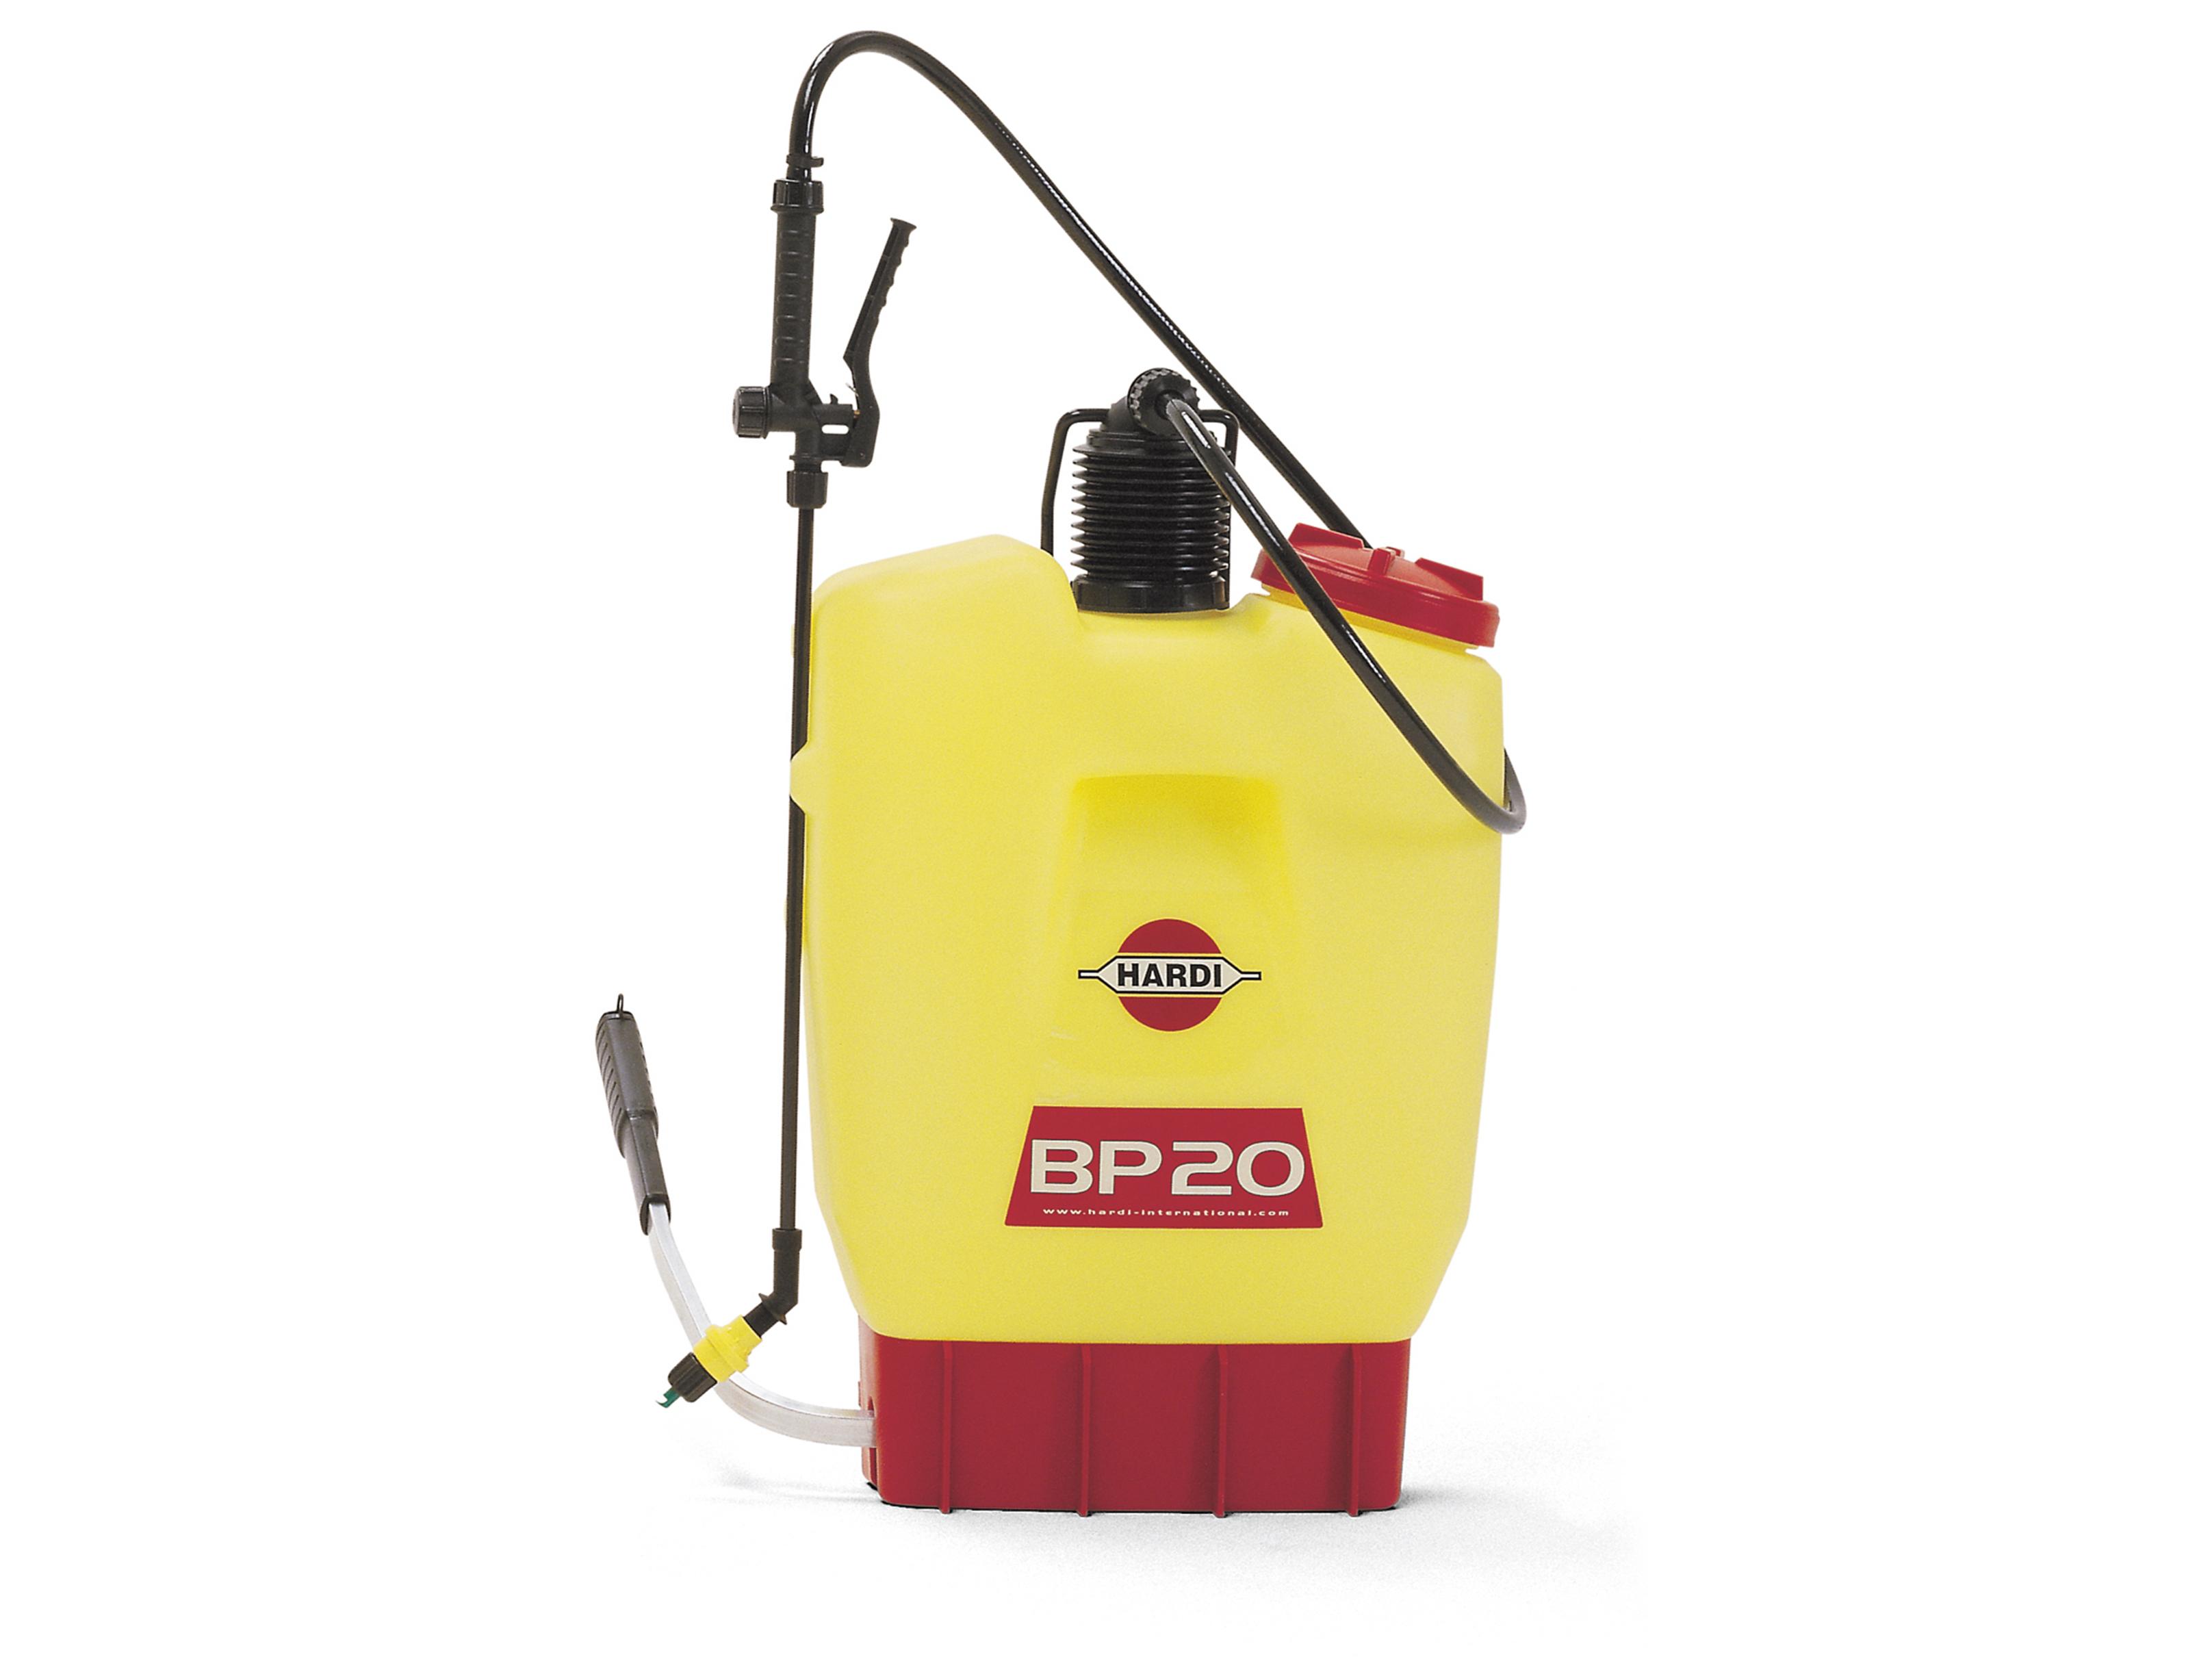 Hardi BP-20 Backpack Sprayer